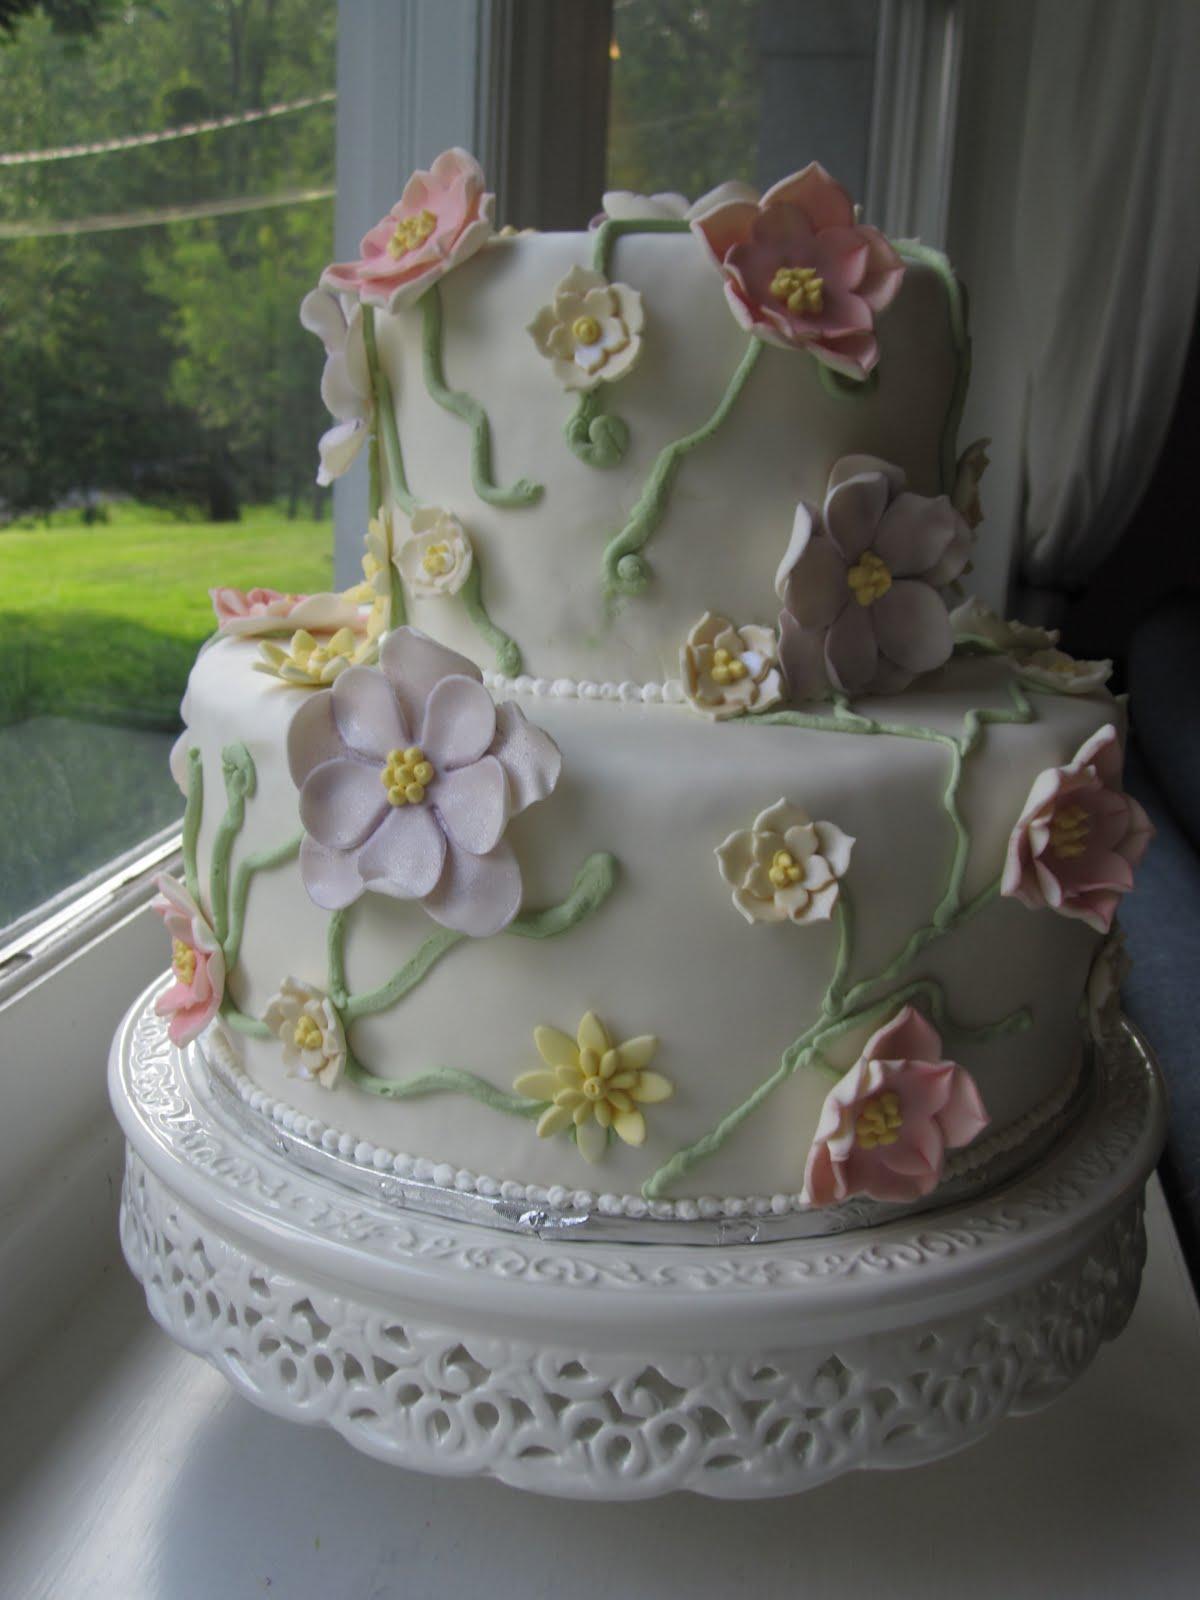 Cake Decorating Classes Dorset : 1000+ images about Cakes on Pinterest Bowl cake, Cake ...